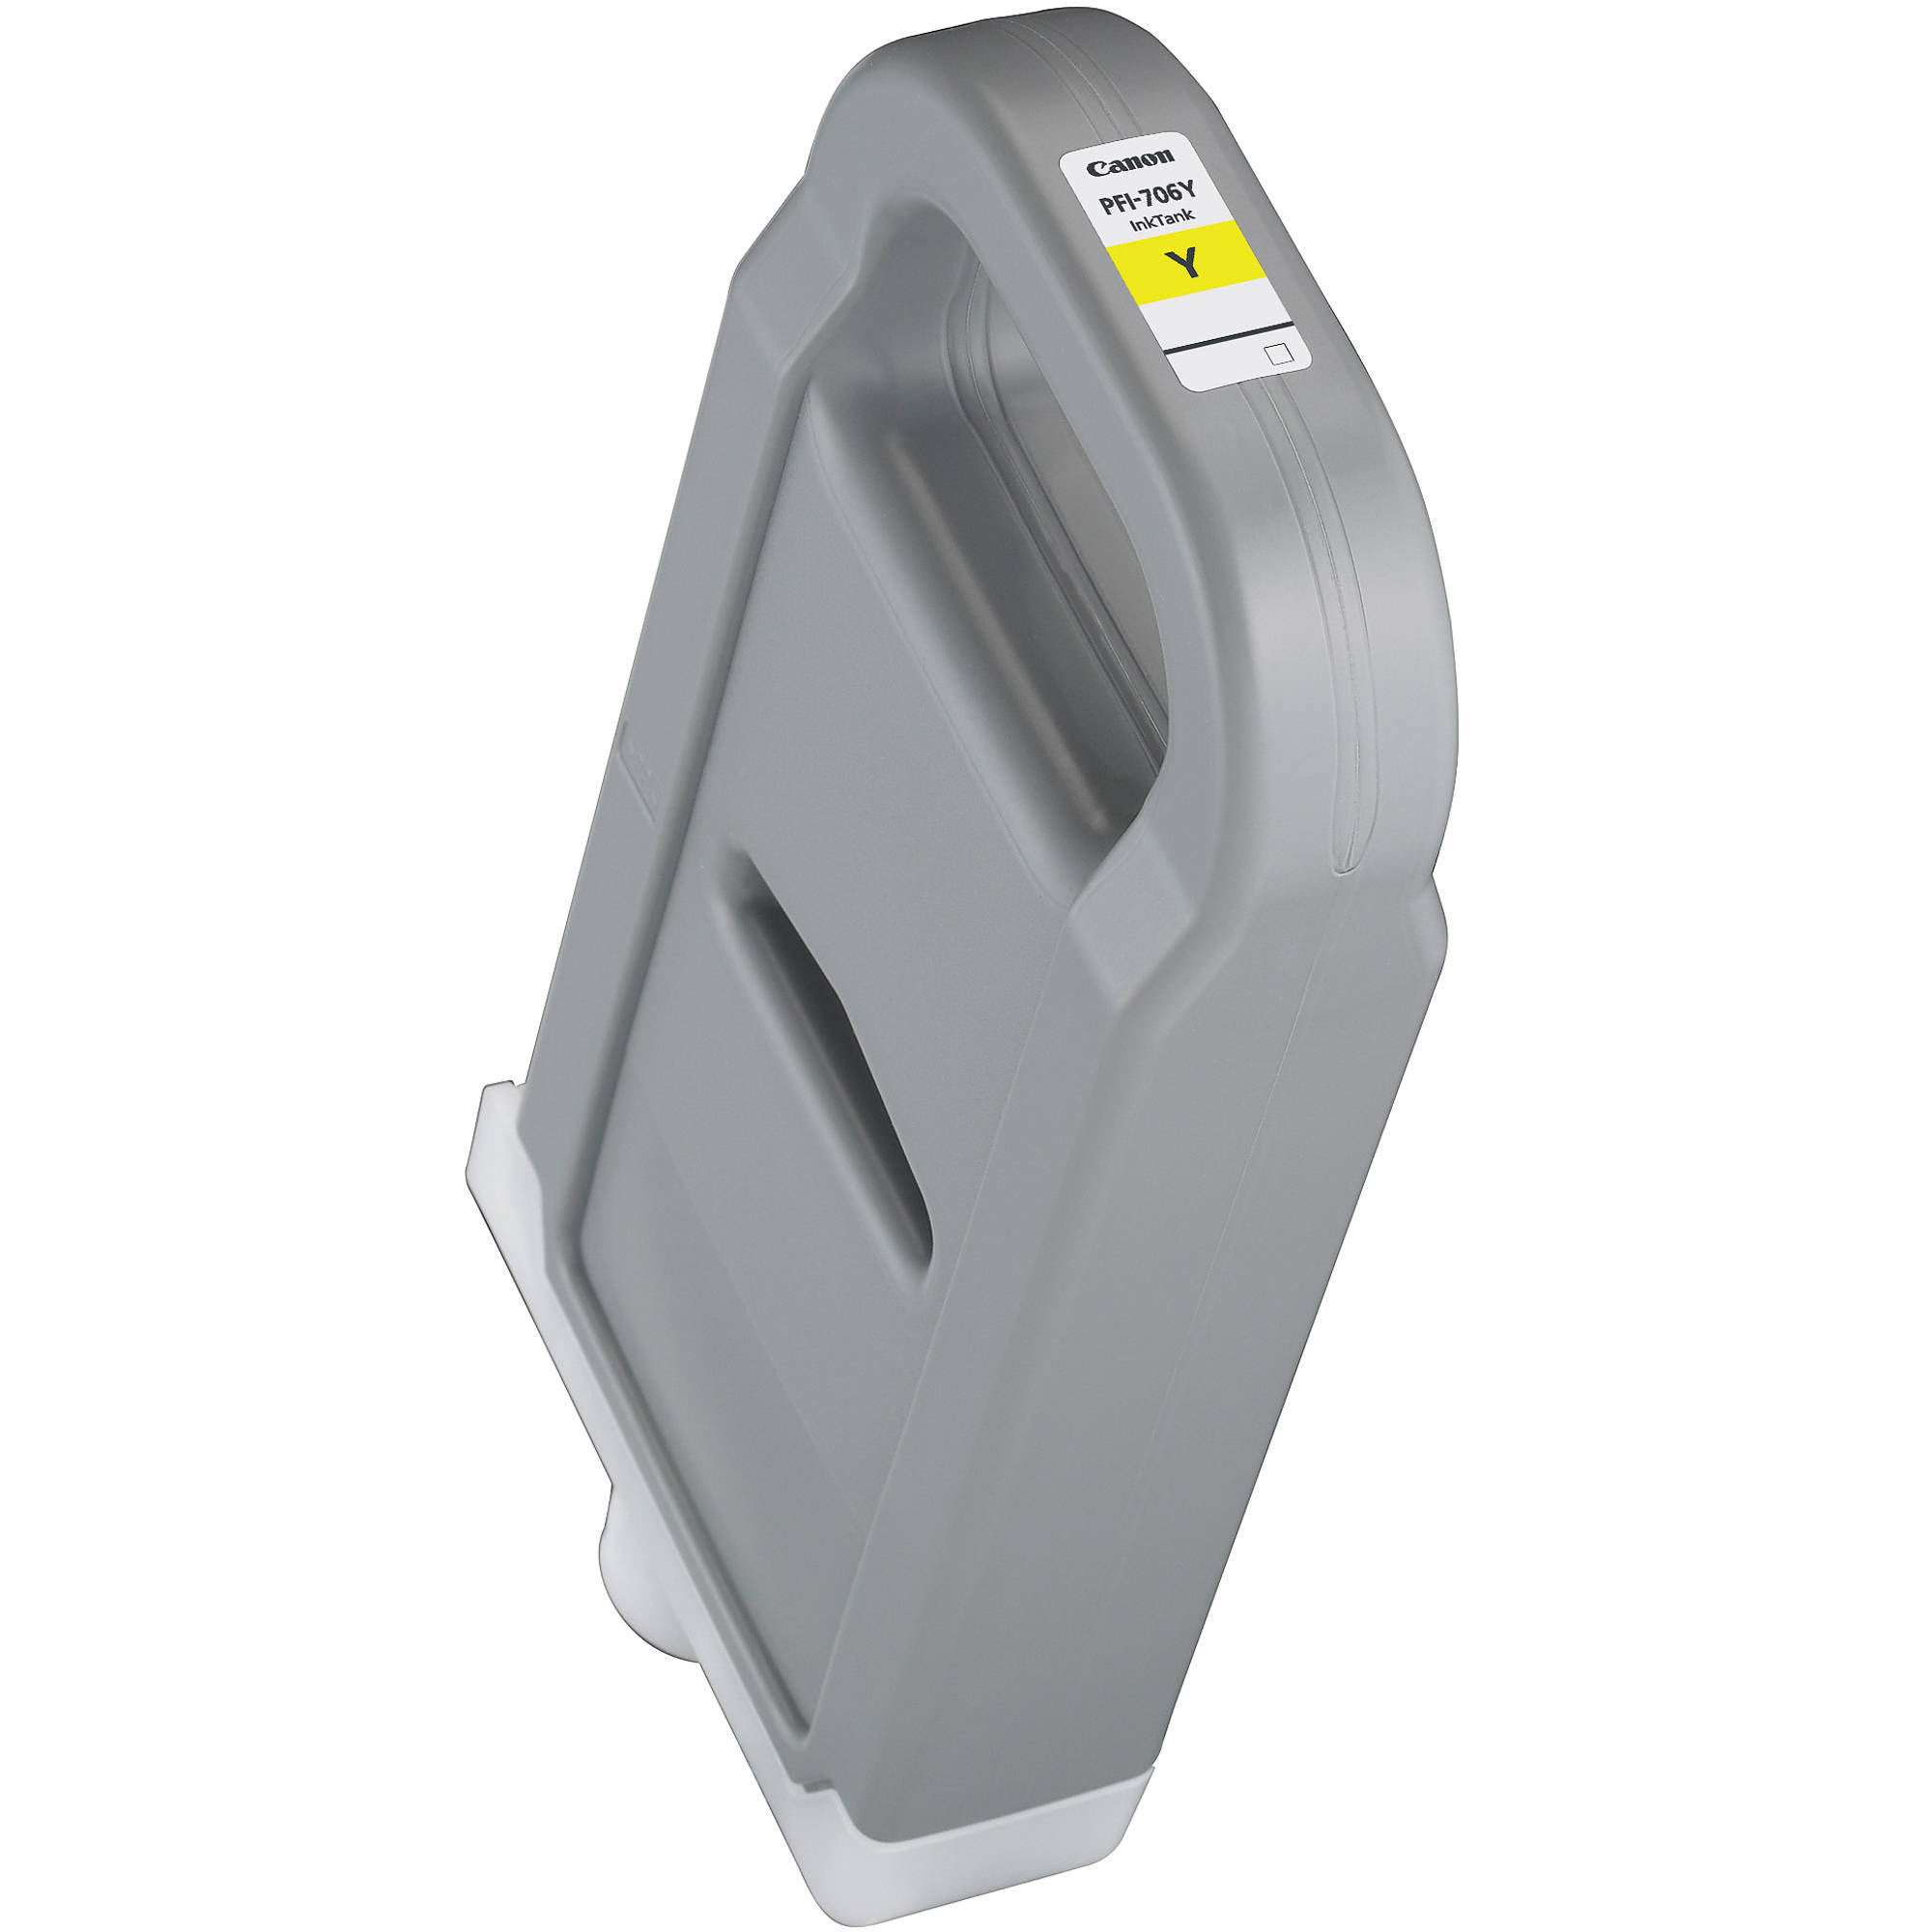 Ink cartridge PFI-706BK 700ml for use w Canon IPF8400s IPF8400se 9400s